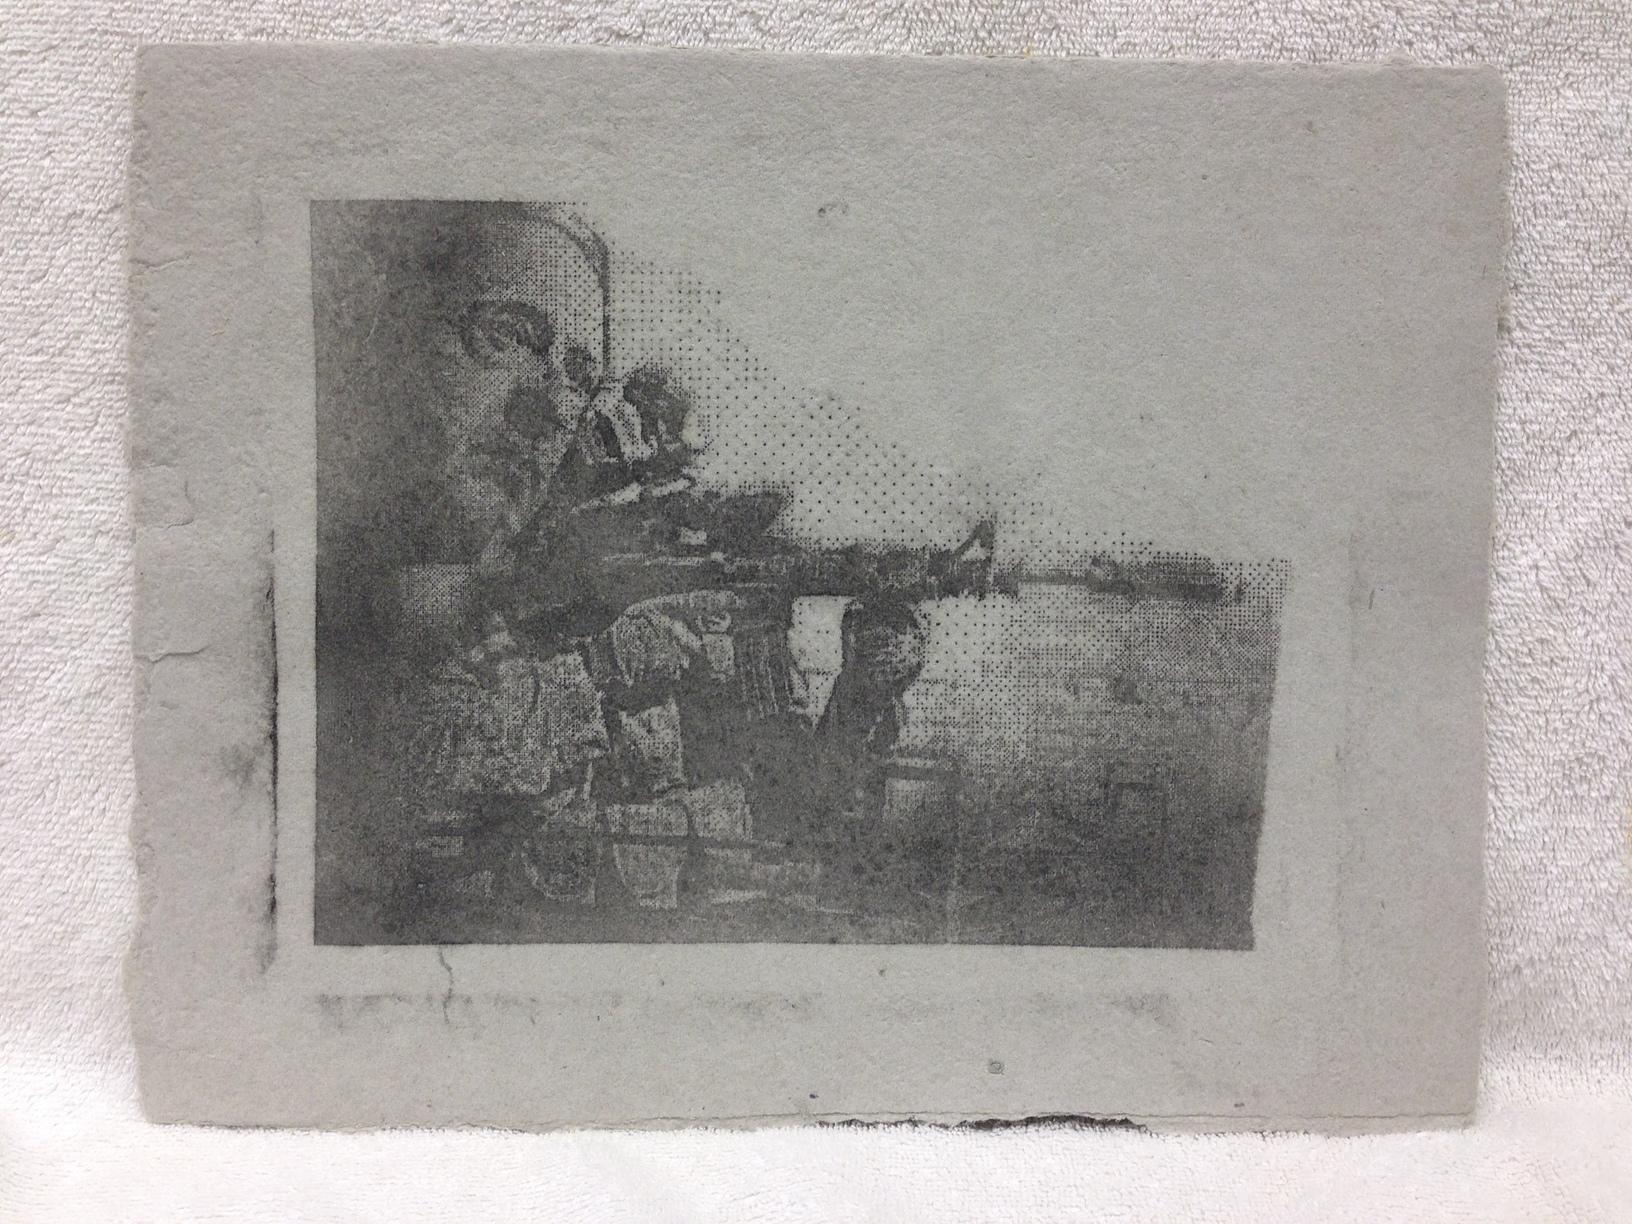 Joe Merritt Marines - Afghanistan _Untitled_ 2013 Silkscreen on handmade paper made from military uniforms Ft Belvoir Workshop IMG_1032JPG.jpg